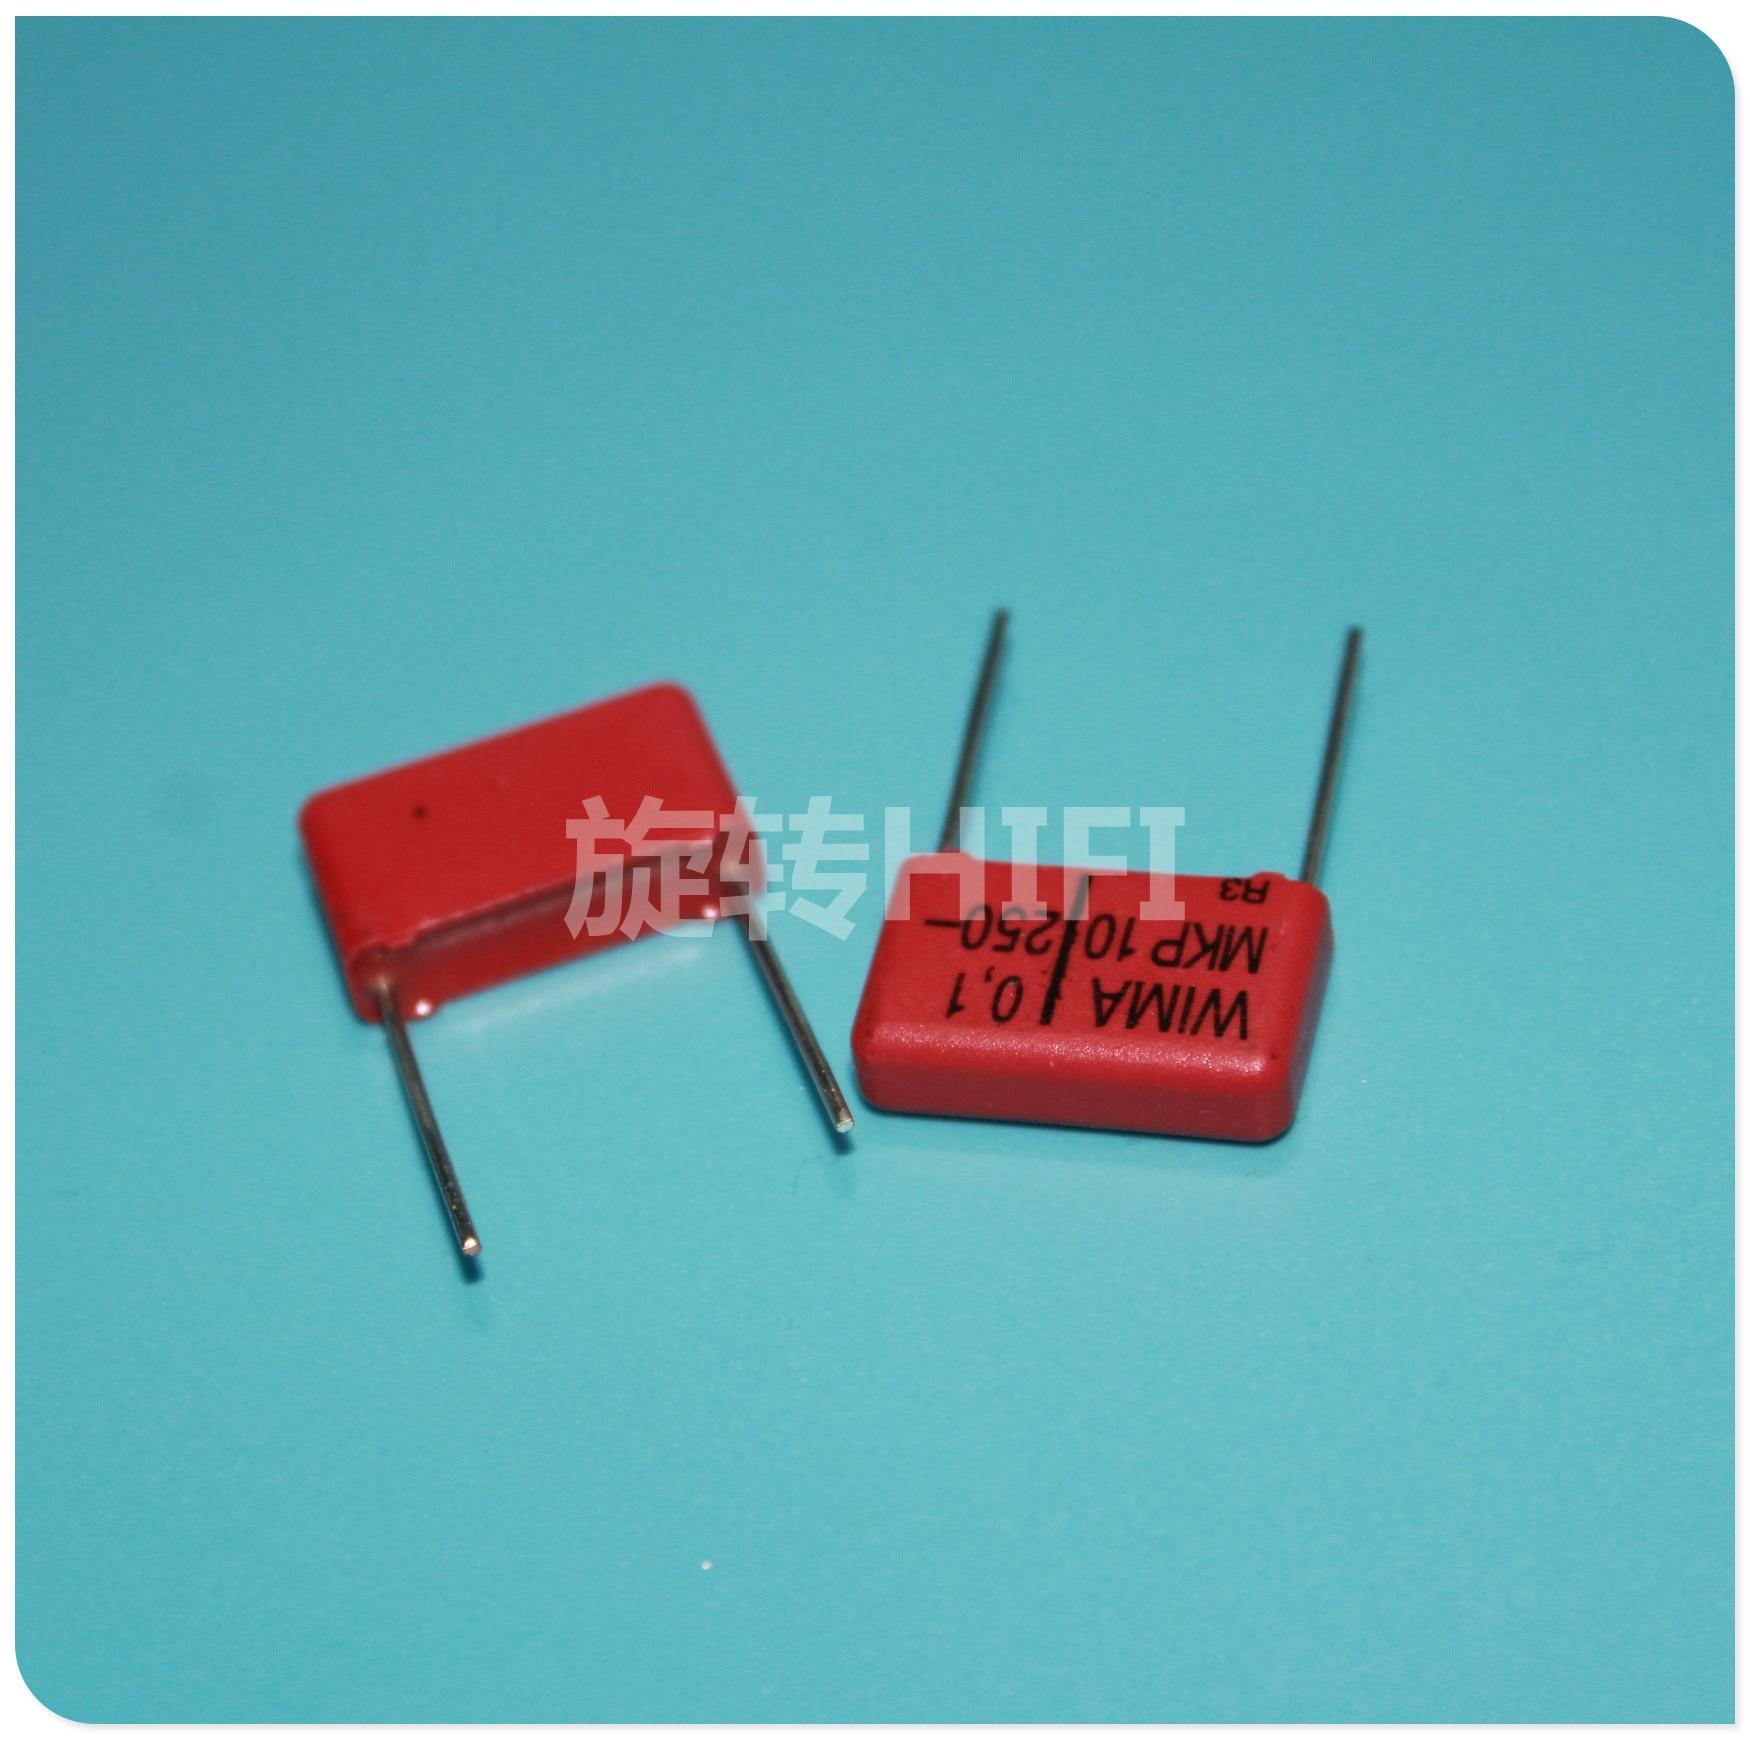 10 Uds rojo WIMA MKP10 100NF/250V p15mm original nuevo MKP-10 104/250V audio 100nf película 104 PCM15 gran oferta 0,1 UF 250V